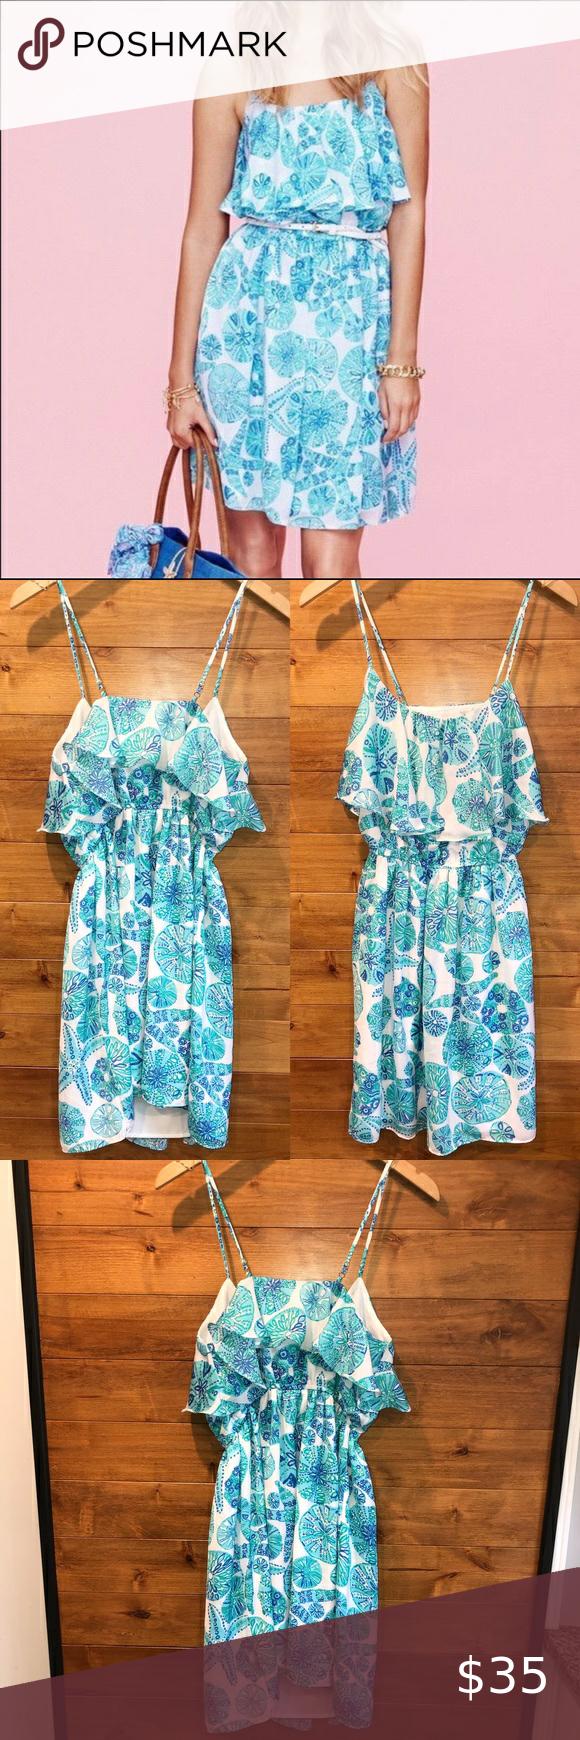 Lilly Pulitzer Target Sand Dollar Dress Small Blue Dollar Dress Clothes Design Fashion [ 1740 x 580 Pixel ]